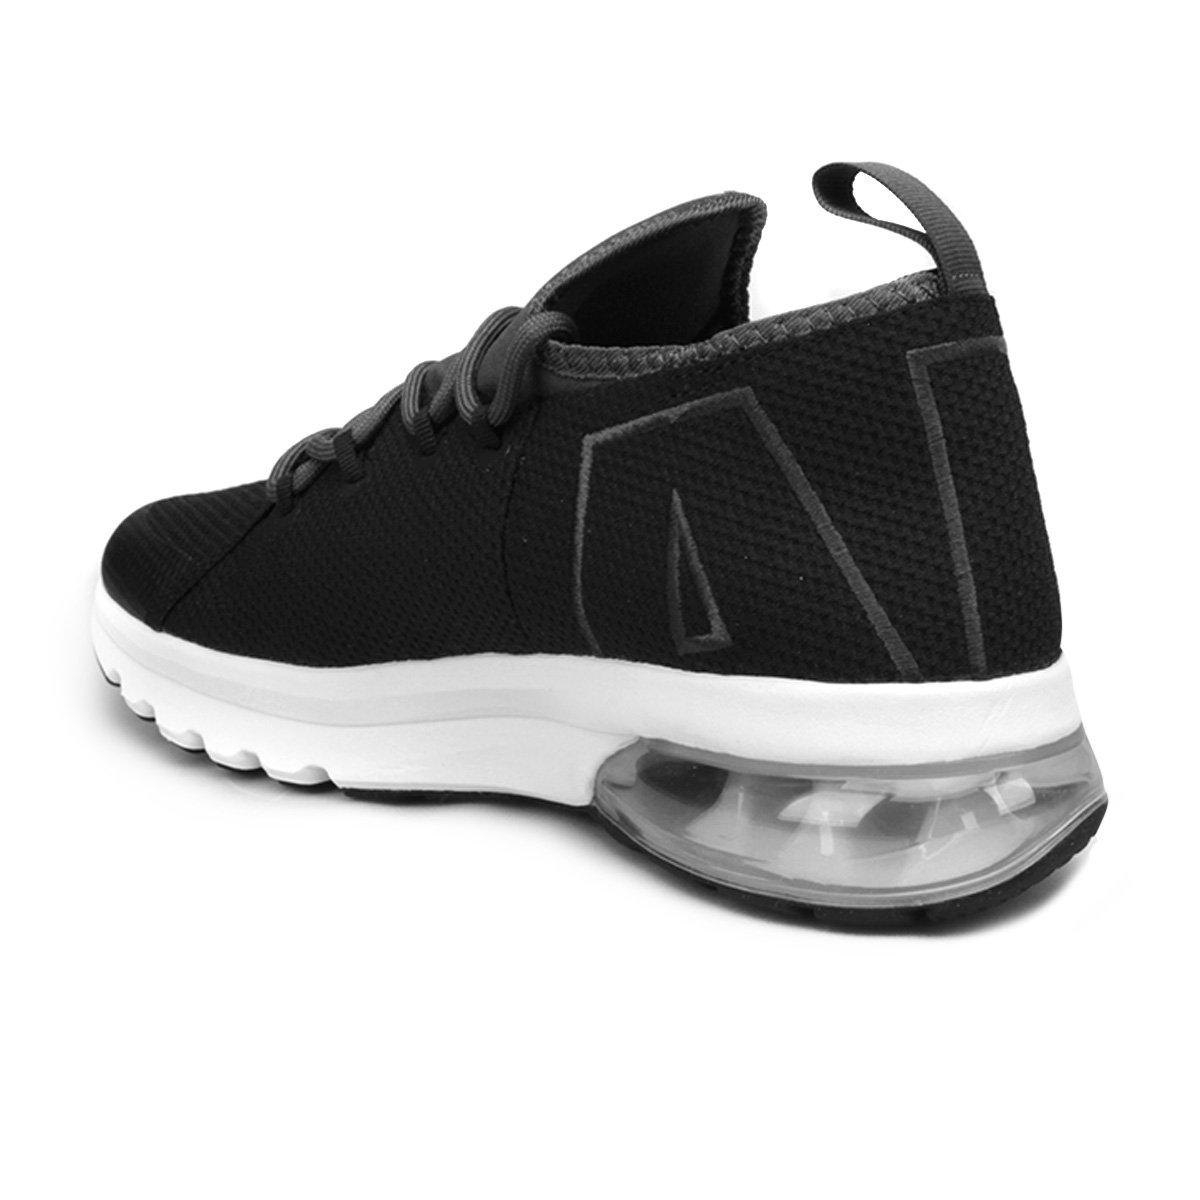 Preto Tênis Air Nike 50 Nike Tênis Masculino Max Flair rw7zxS8aqw